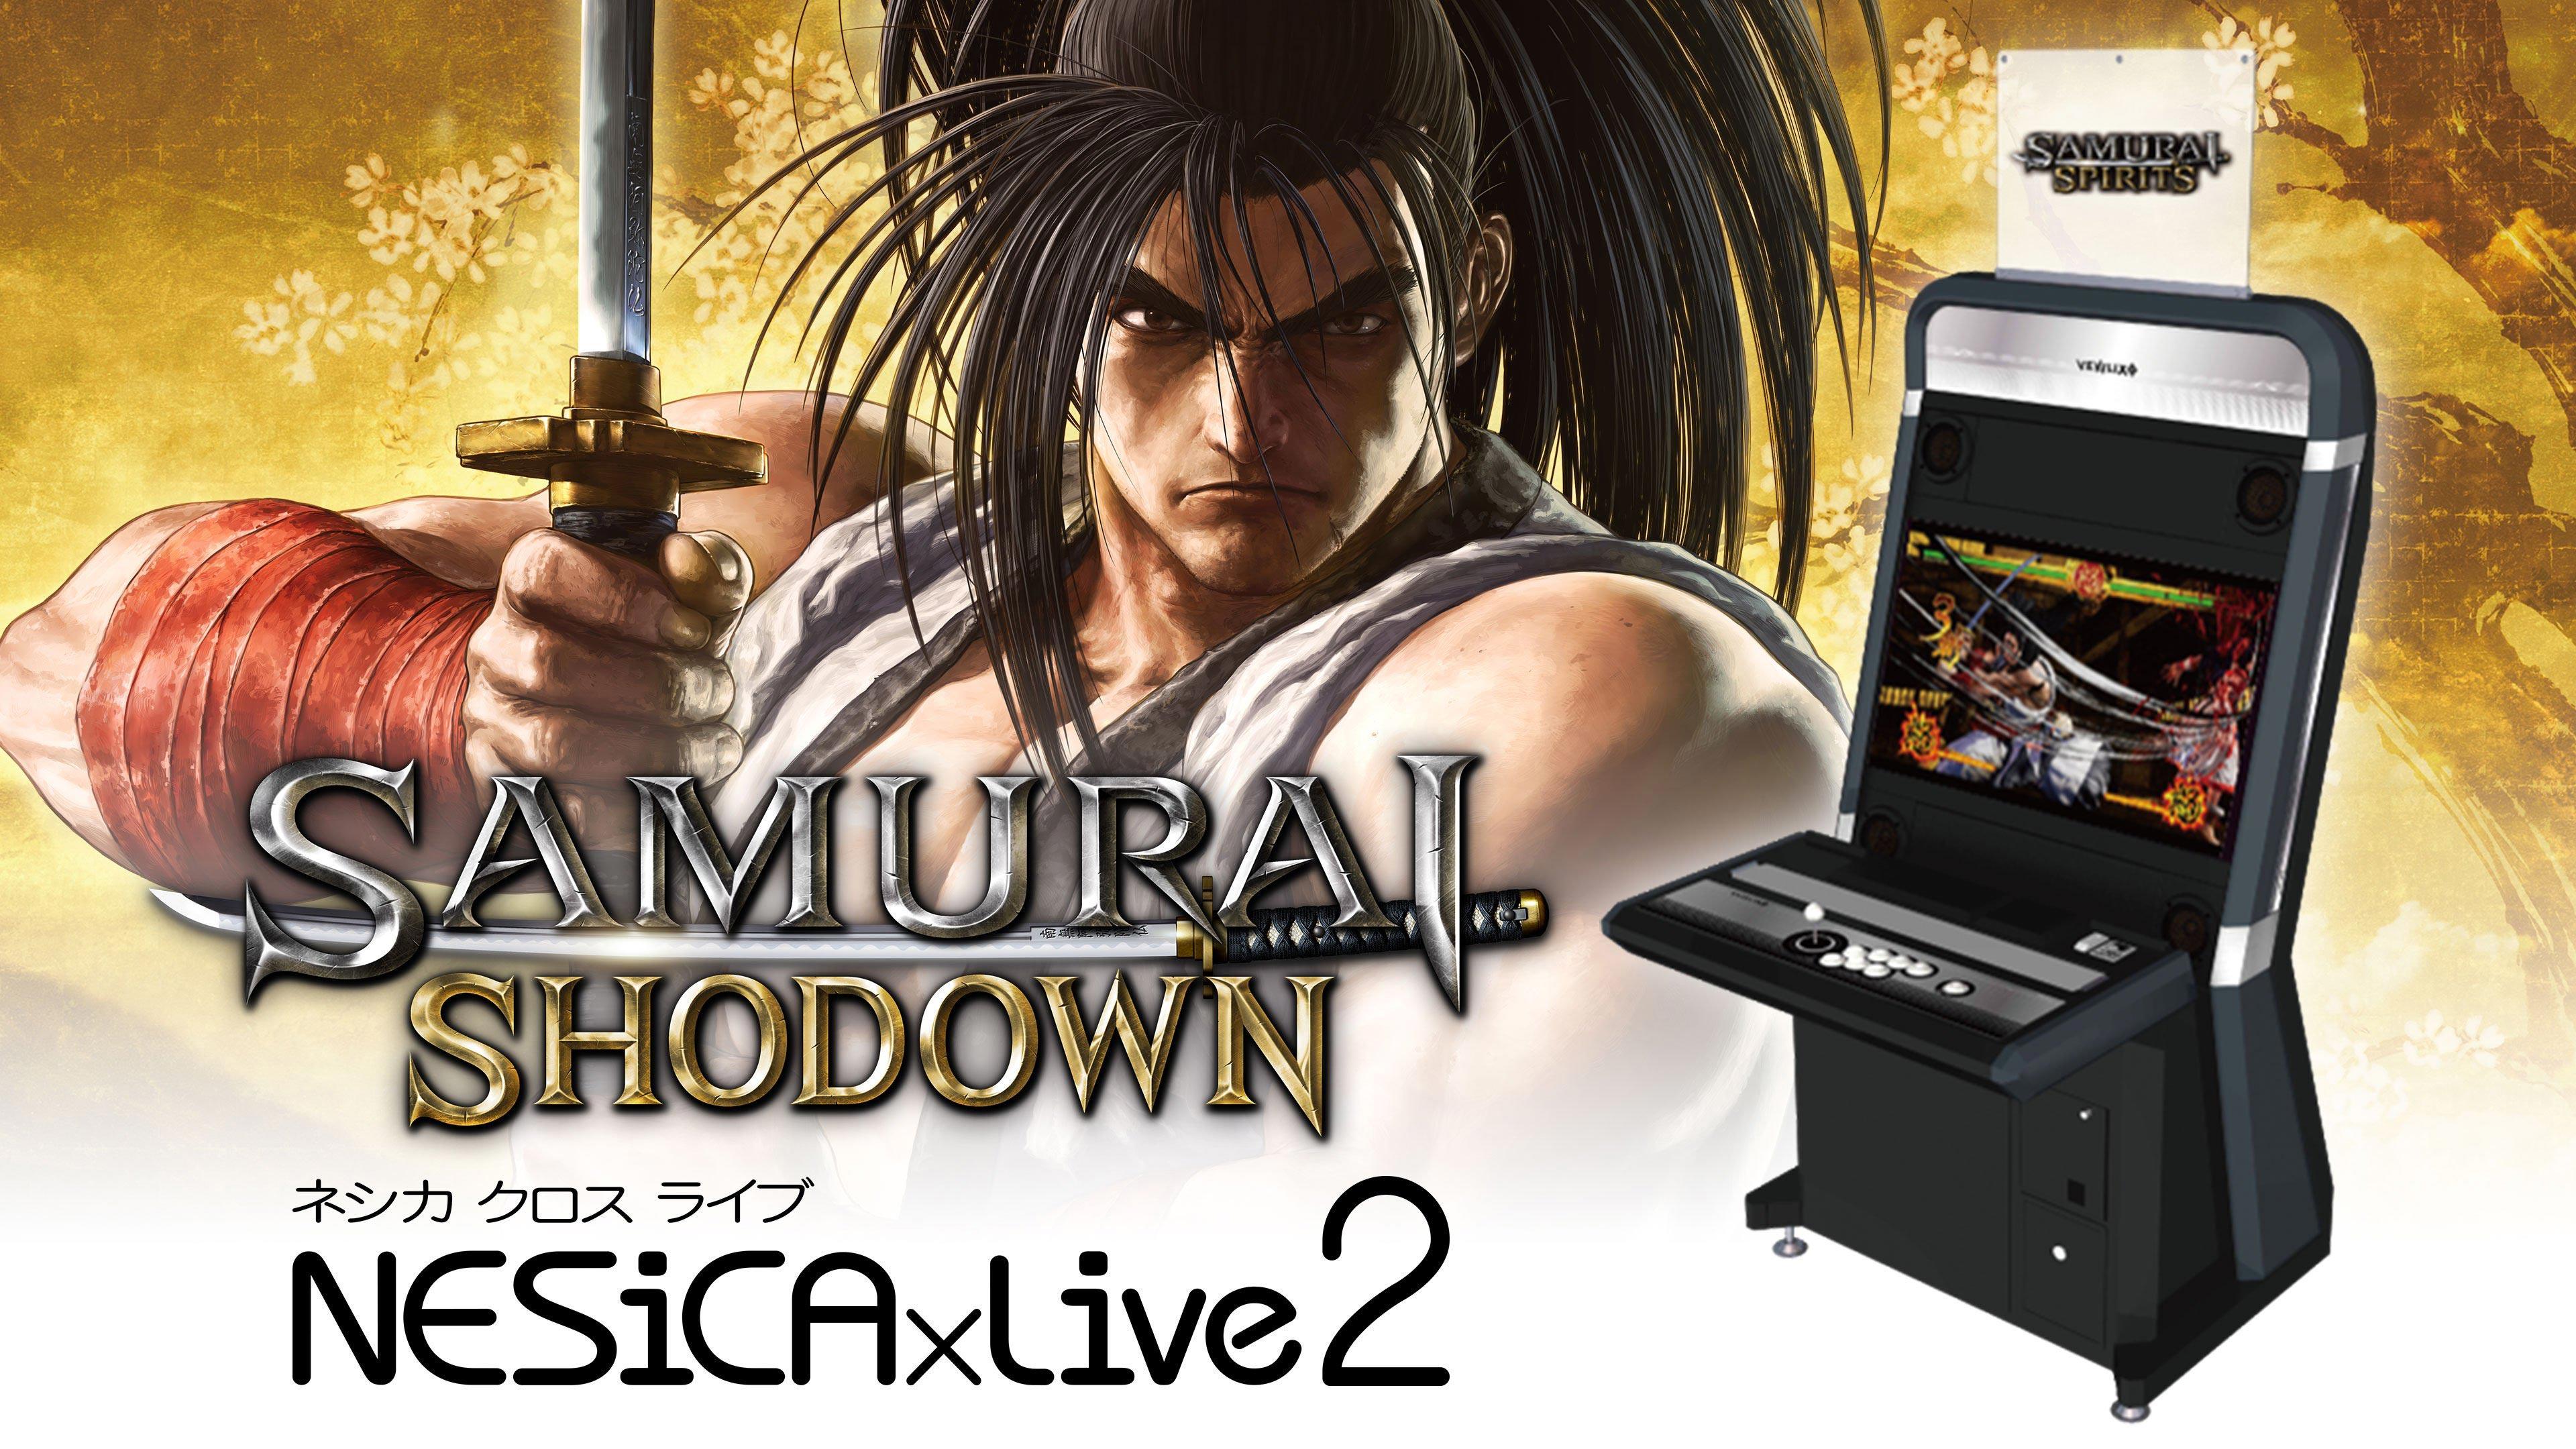 Samurai Shodown Amazon 2 out of 3 image gallery